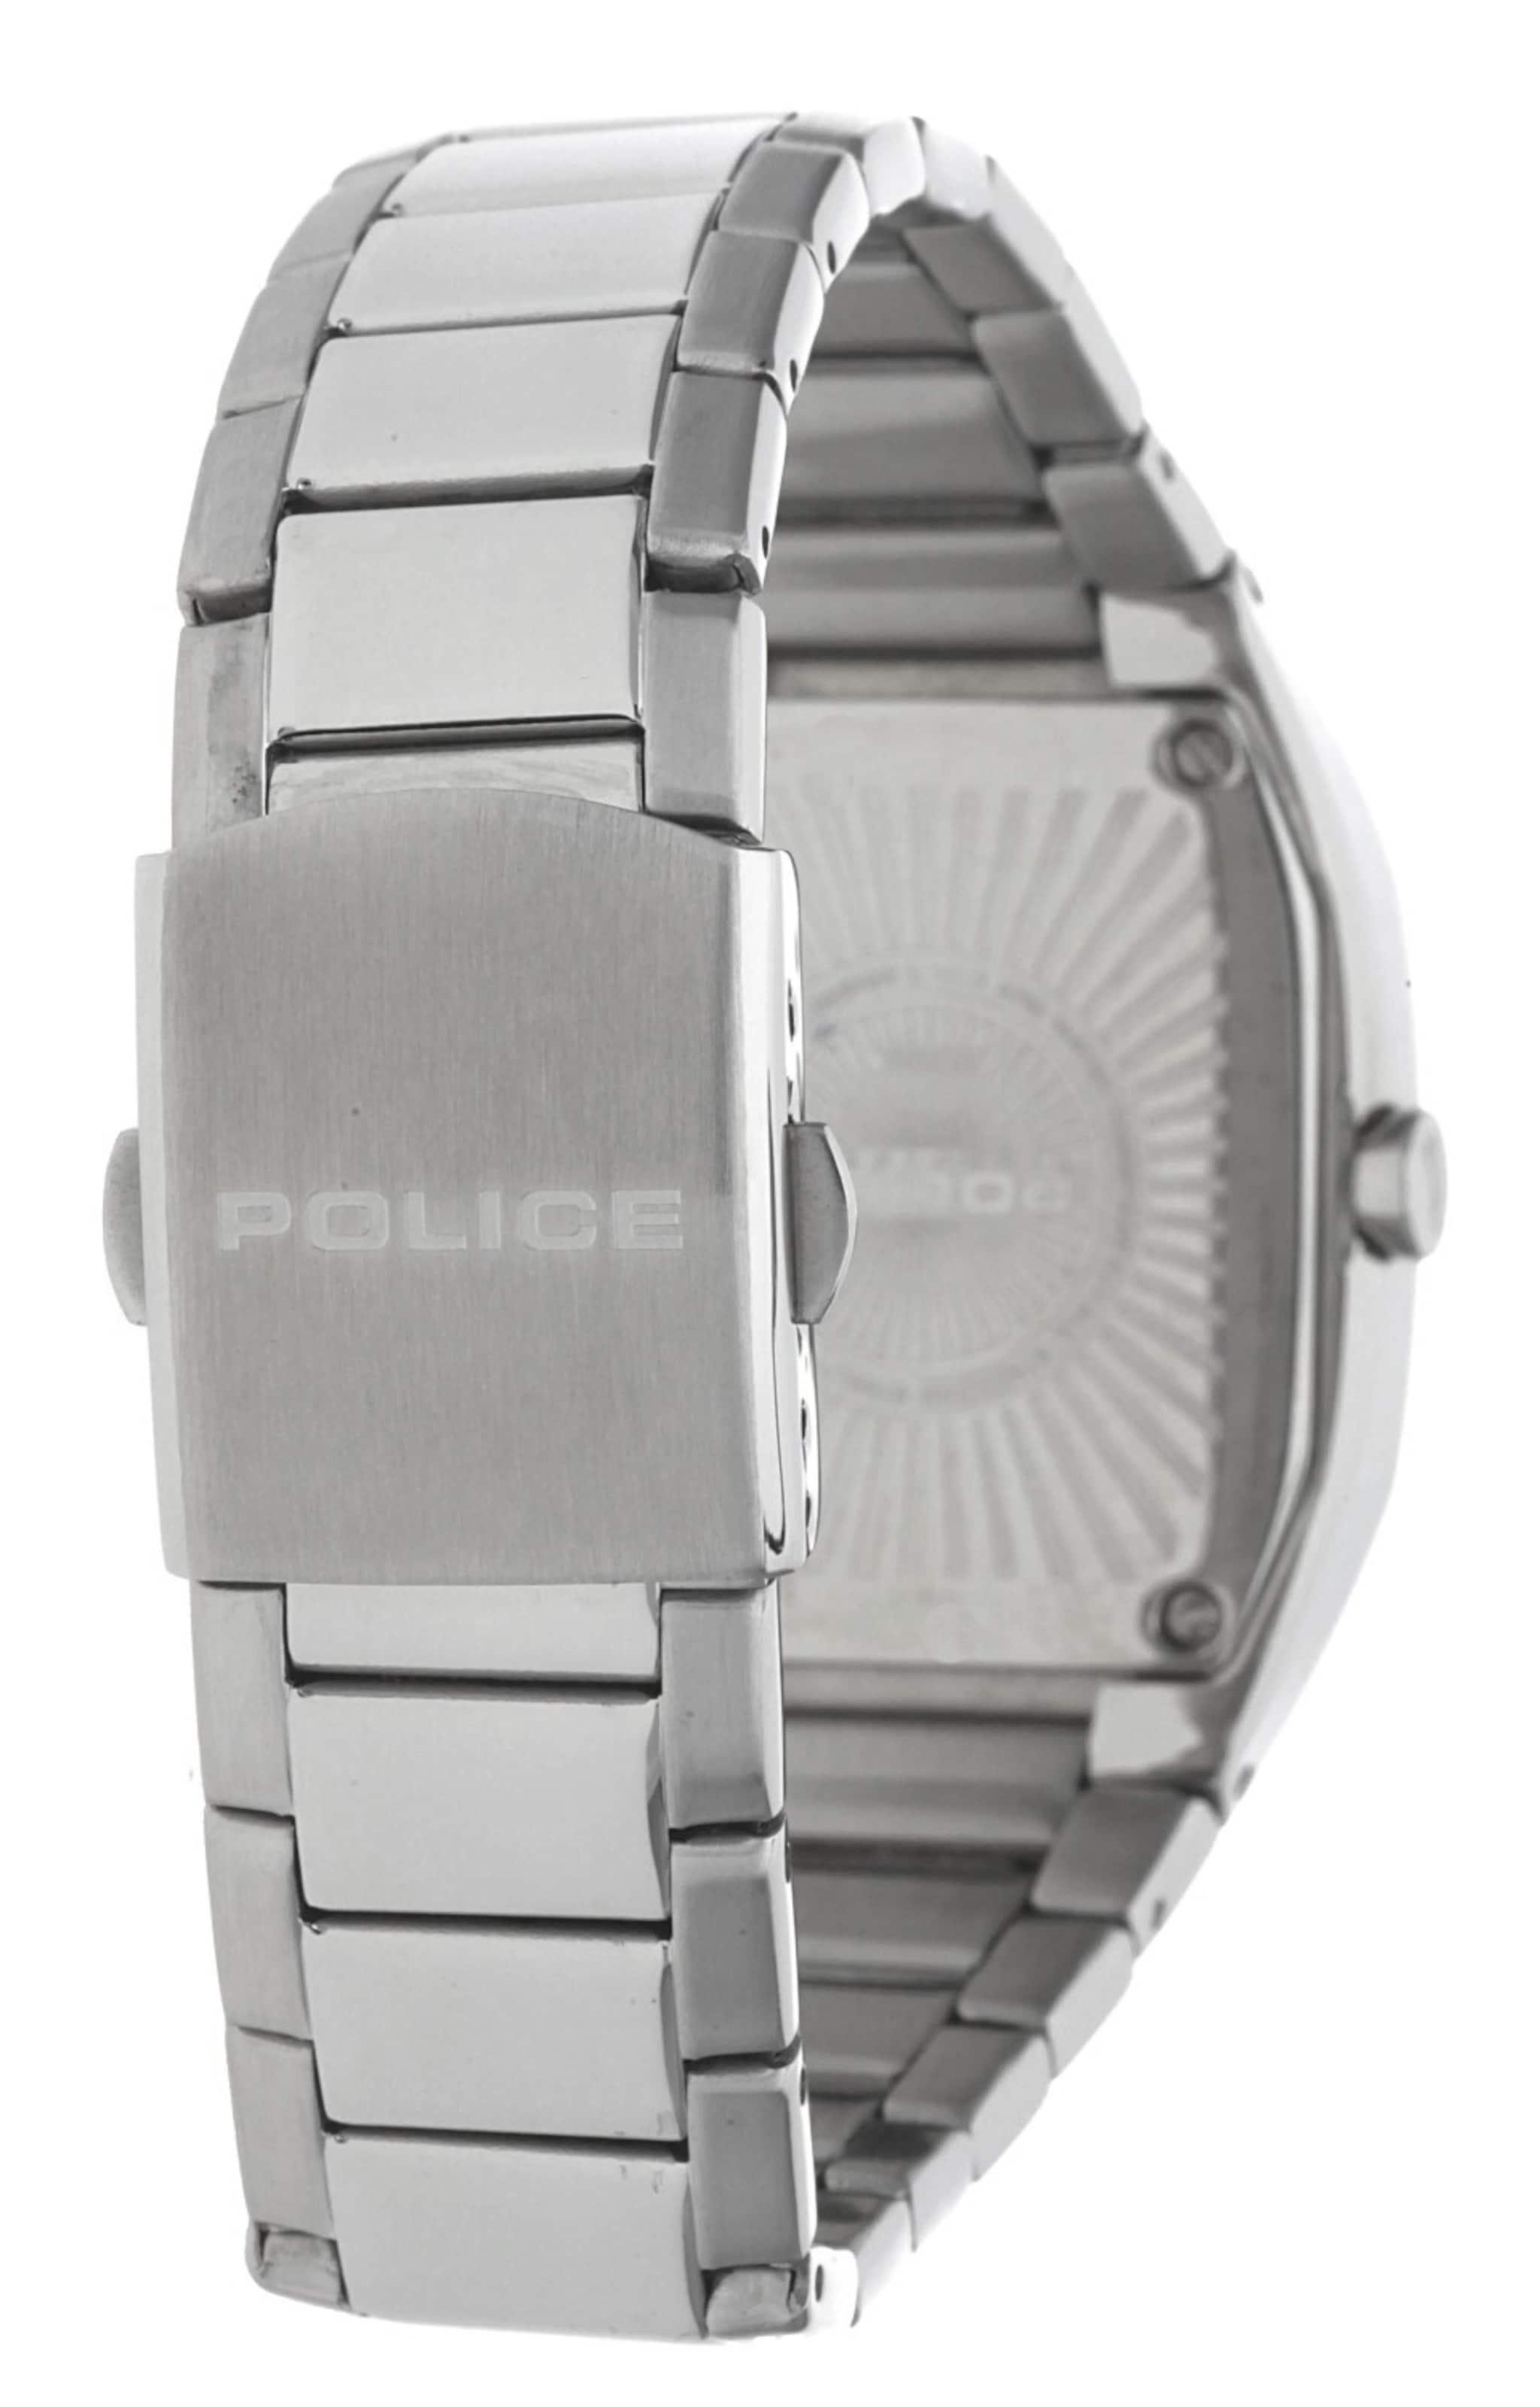 POLICE Armbanduhr Octane P12895LS-02M Extrem Online bOUKKMkl9D